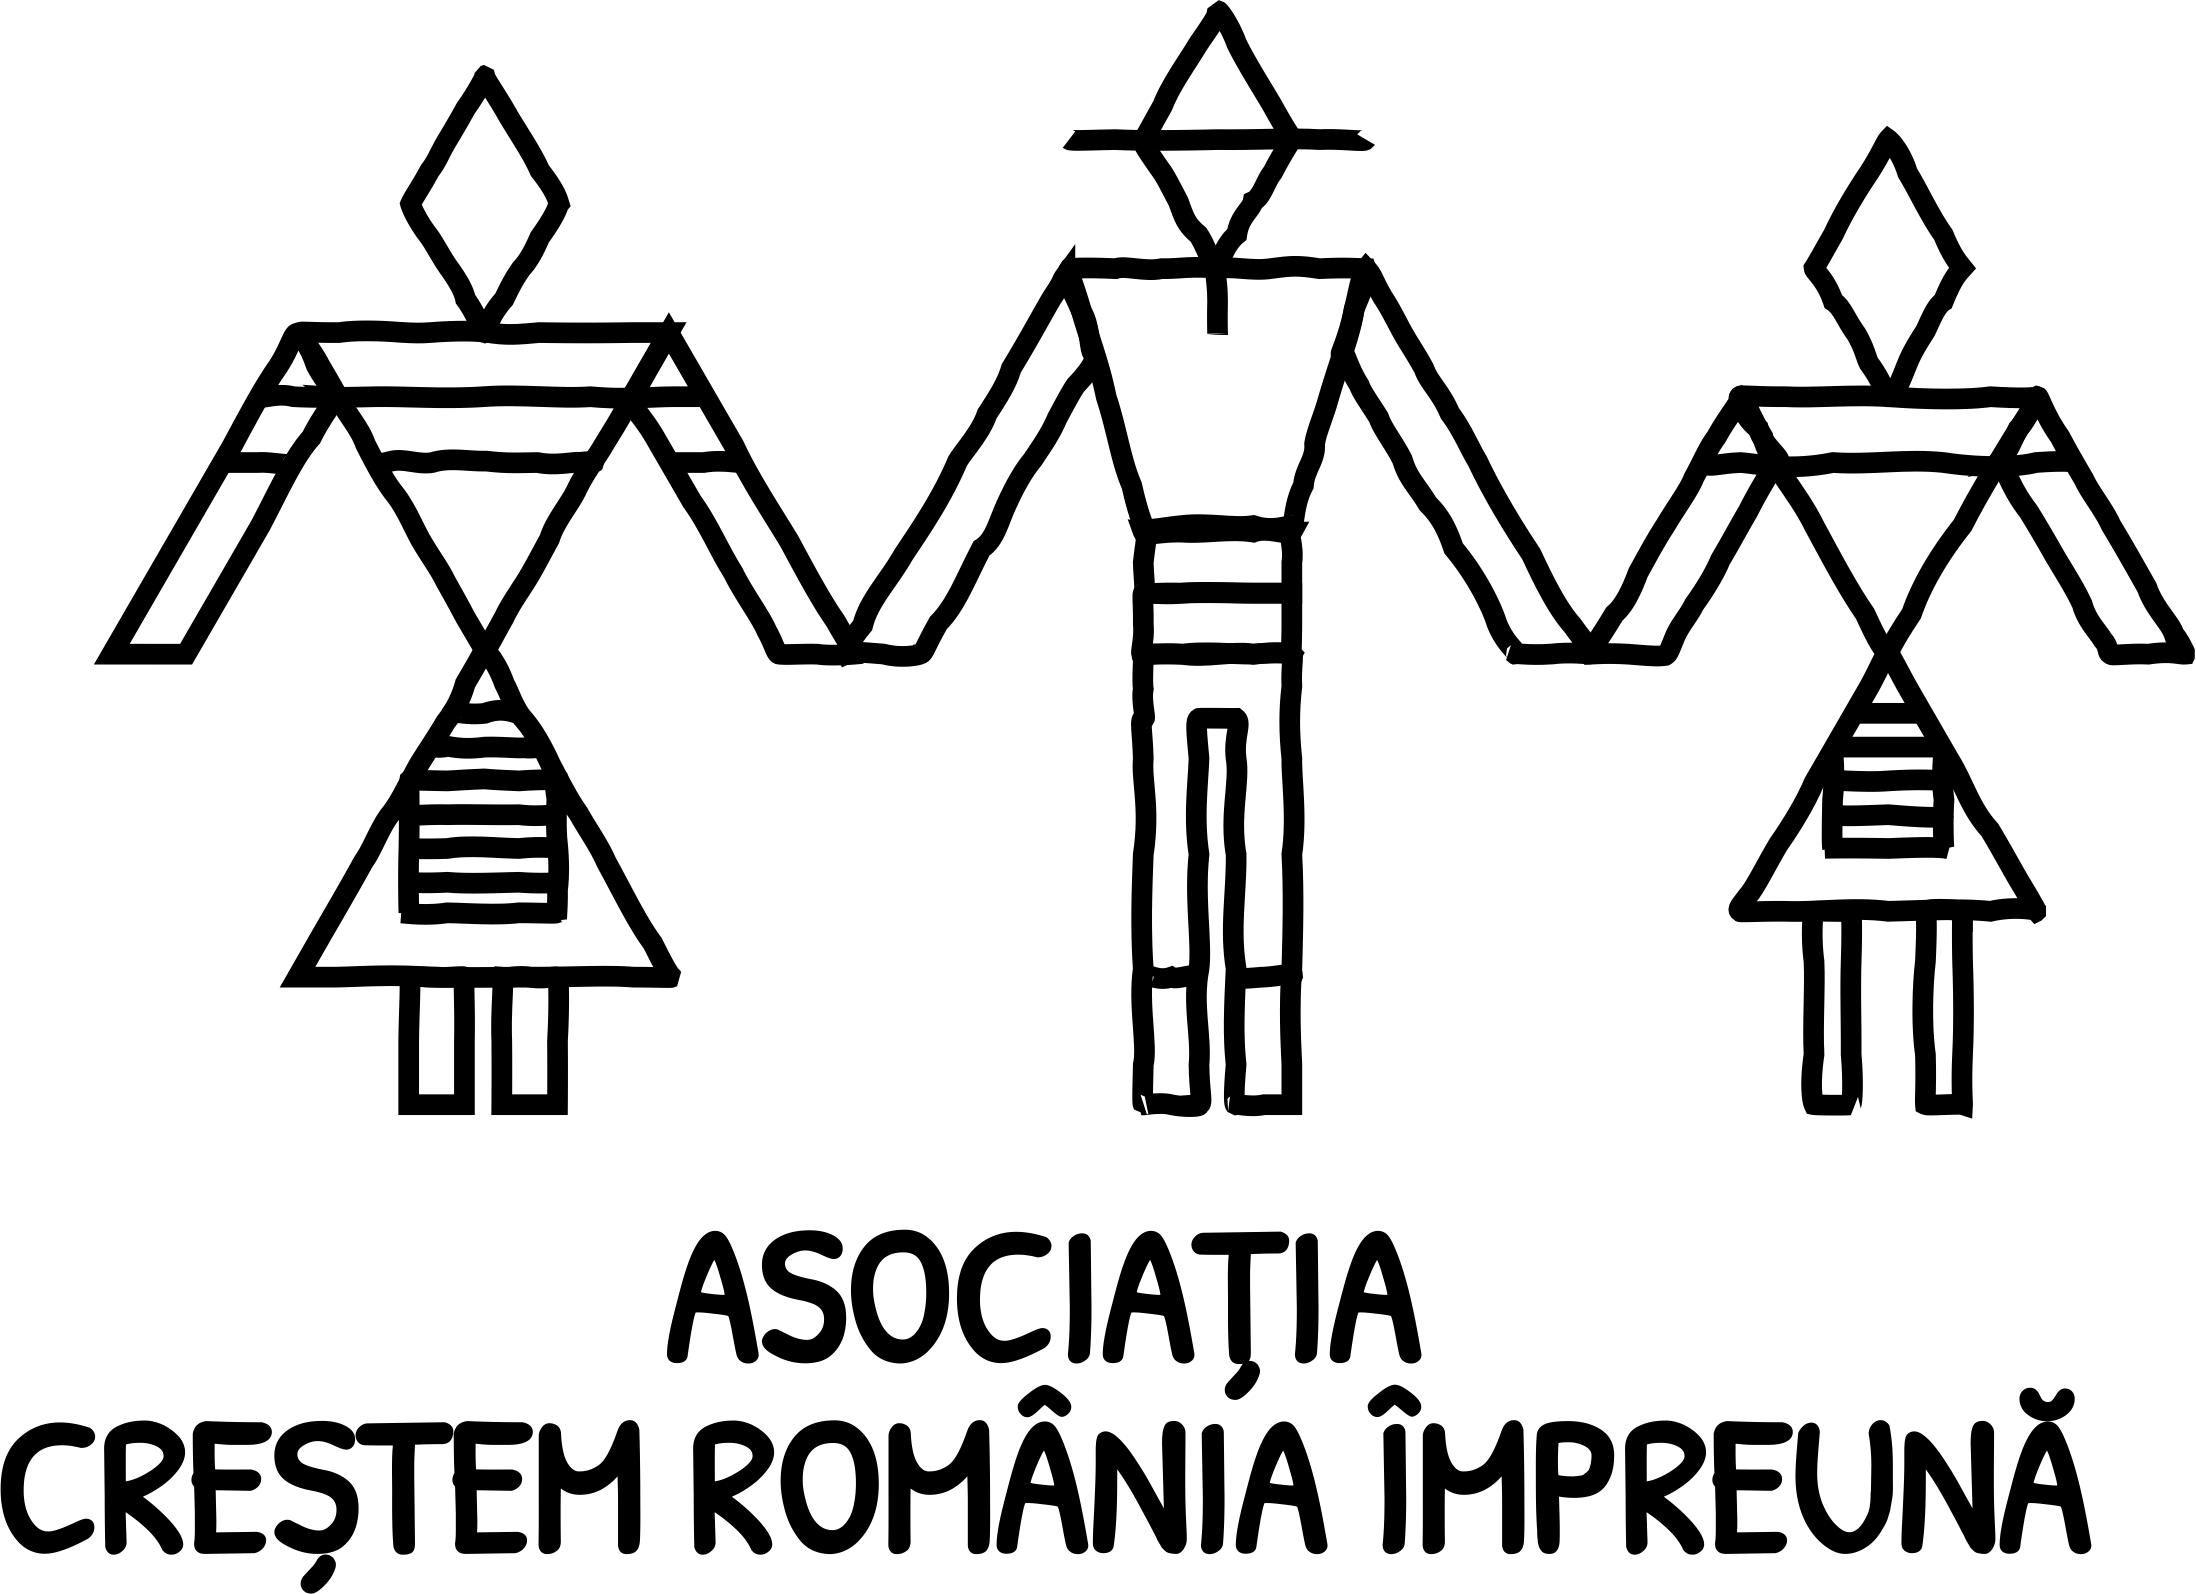 Asociația Creștem România Împreună logo